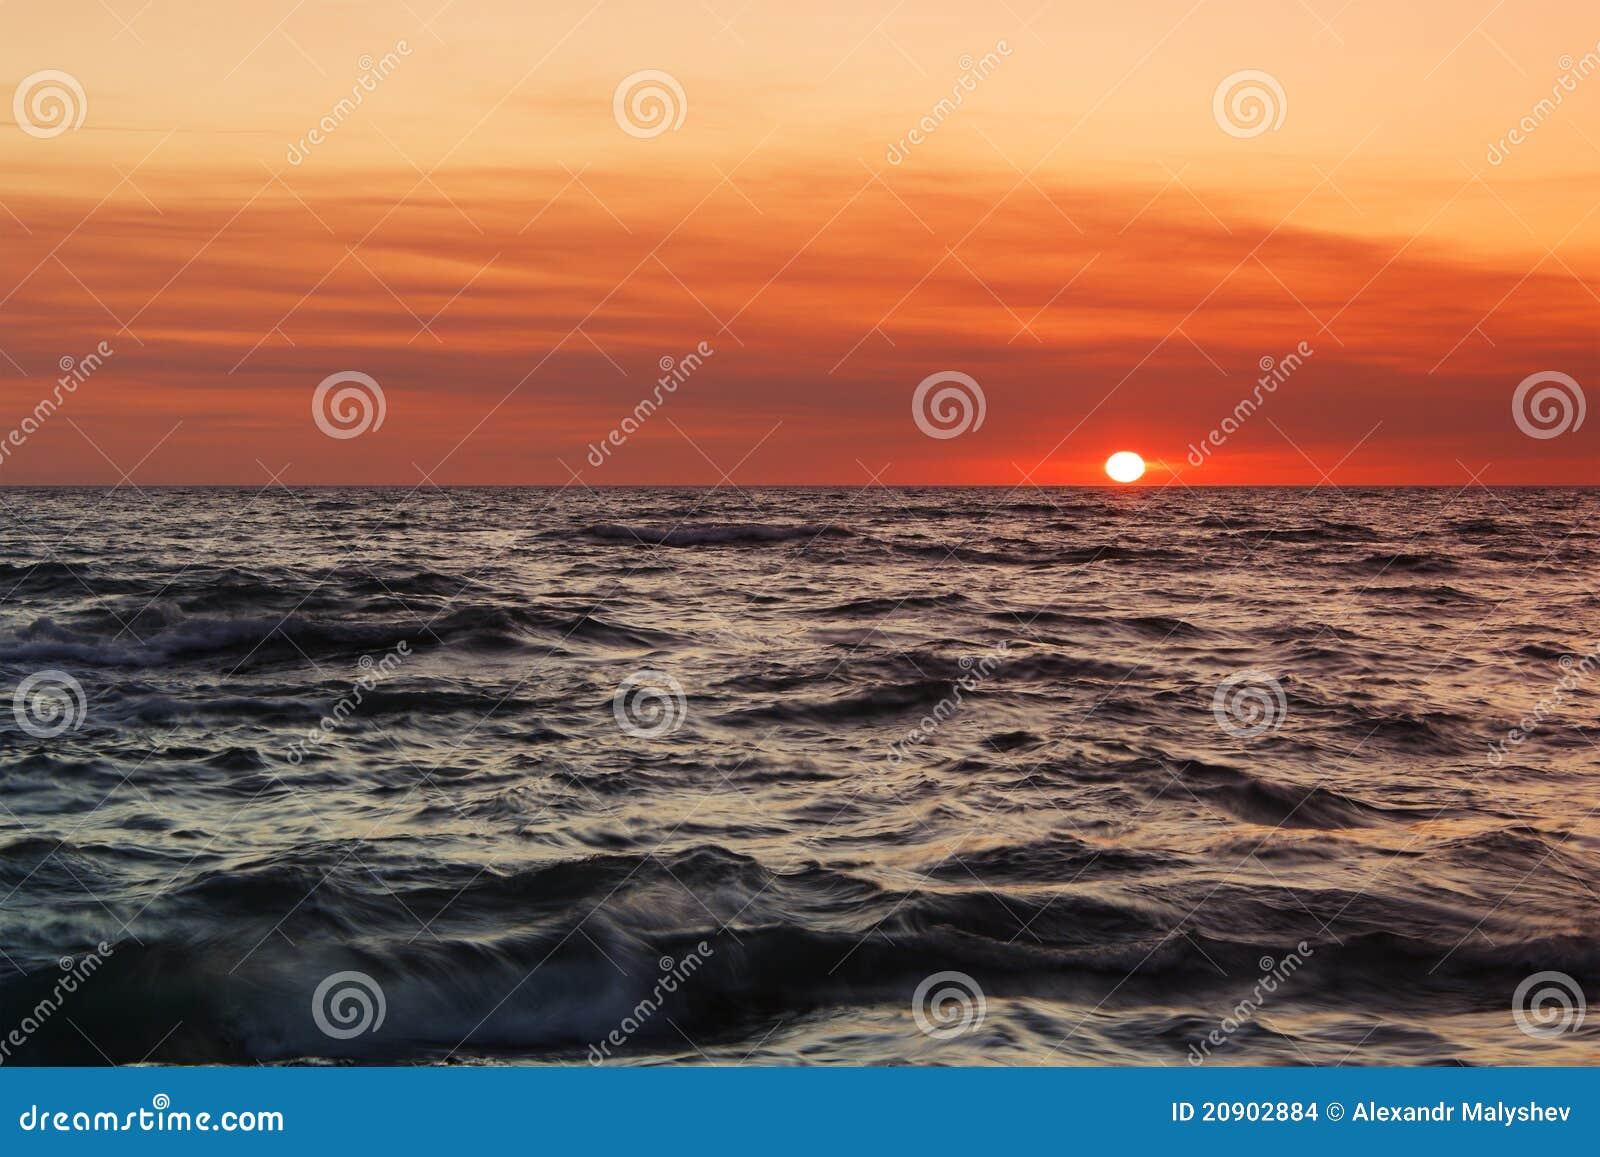 Sunset at Sea.